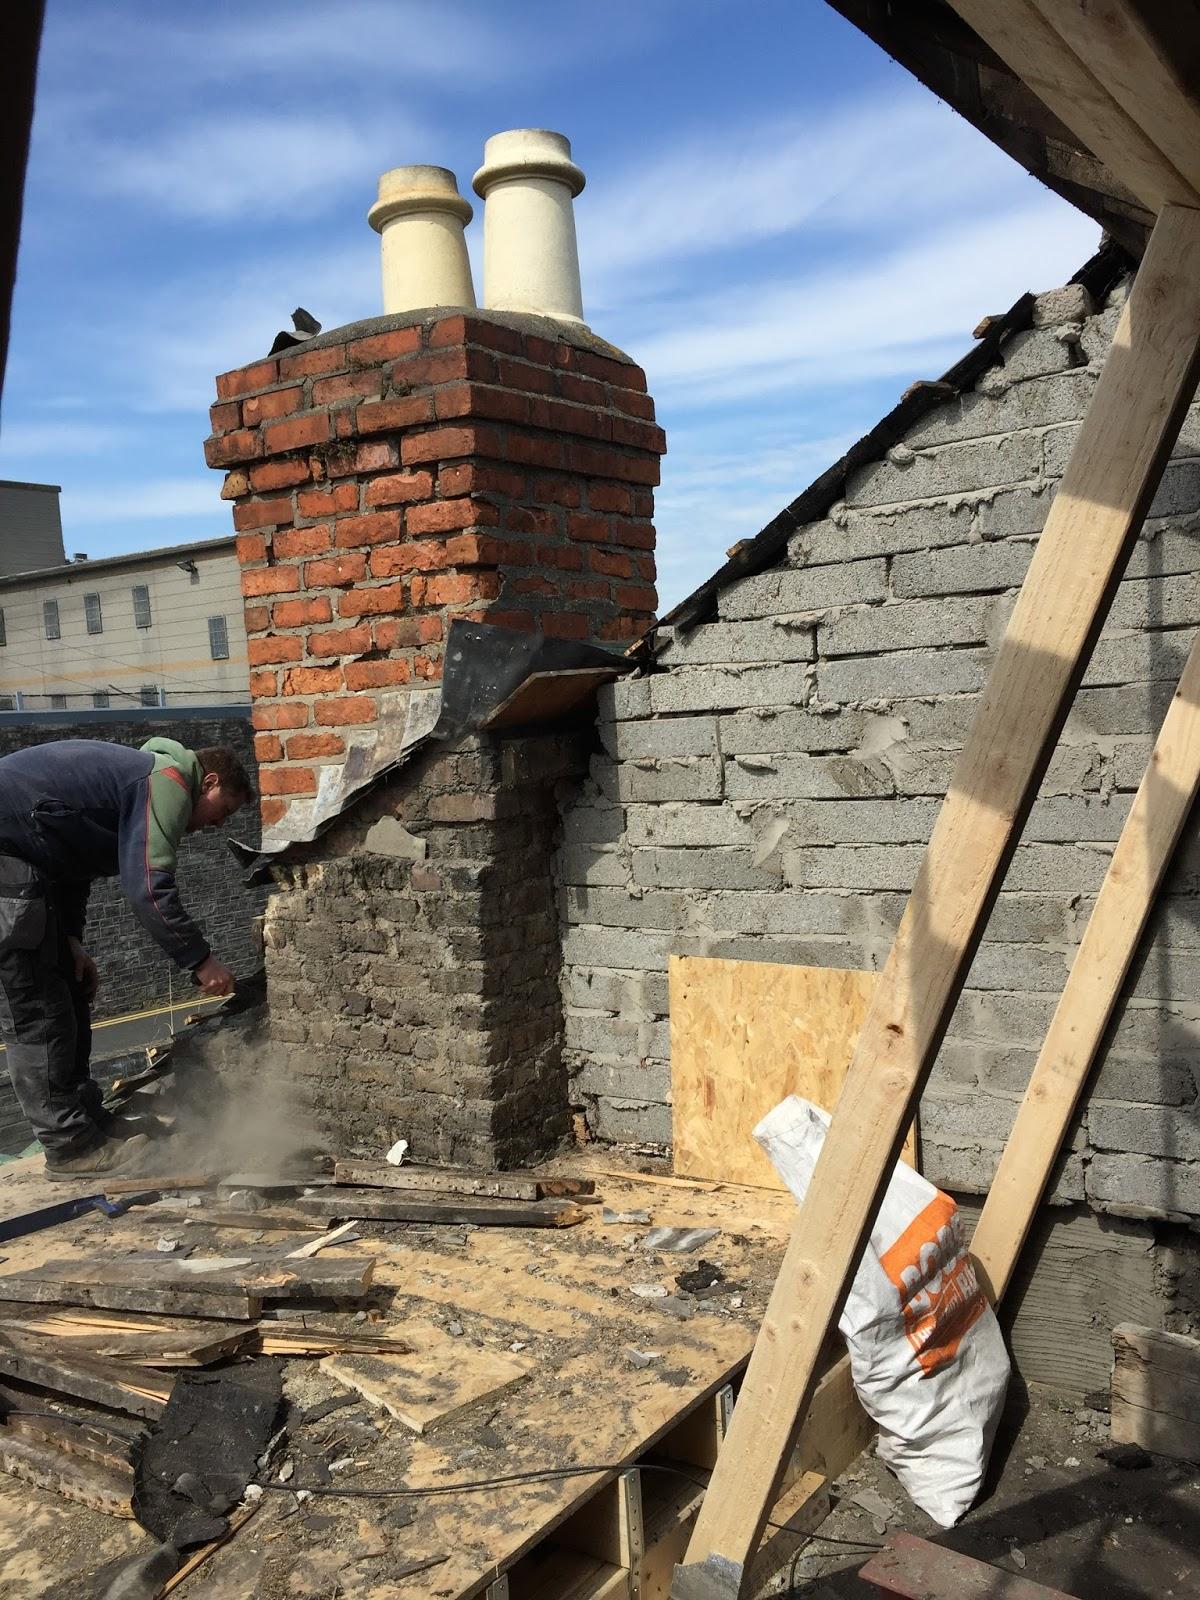 No more roof